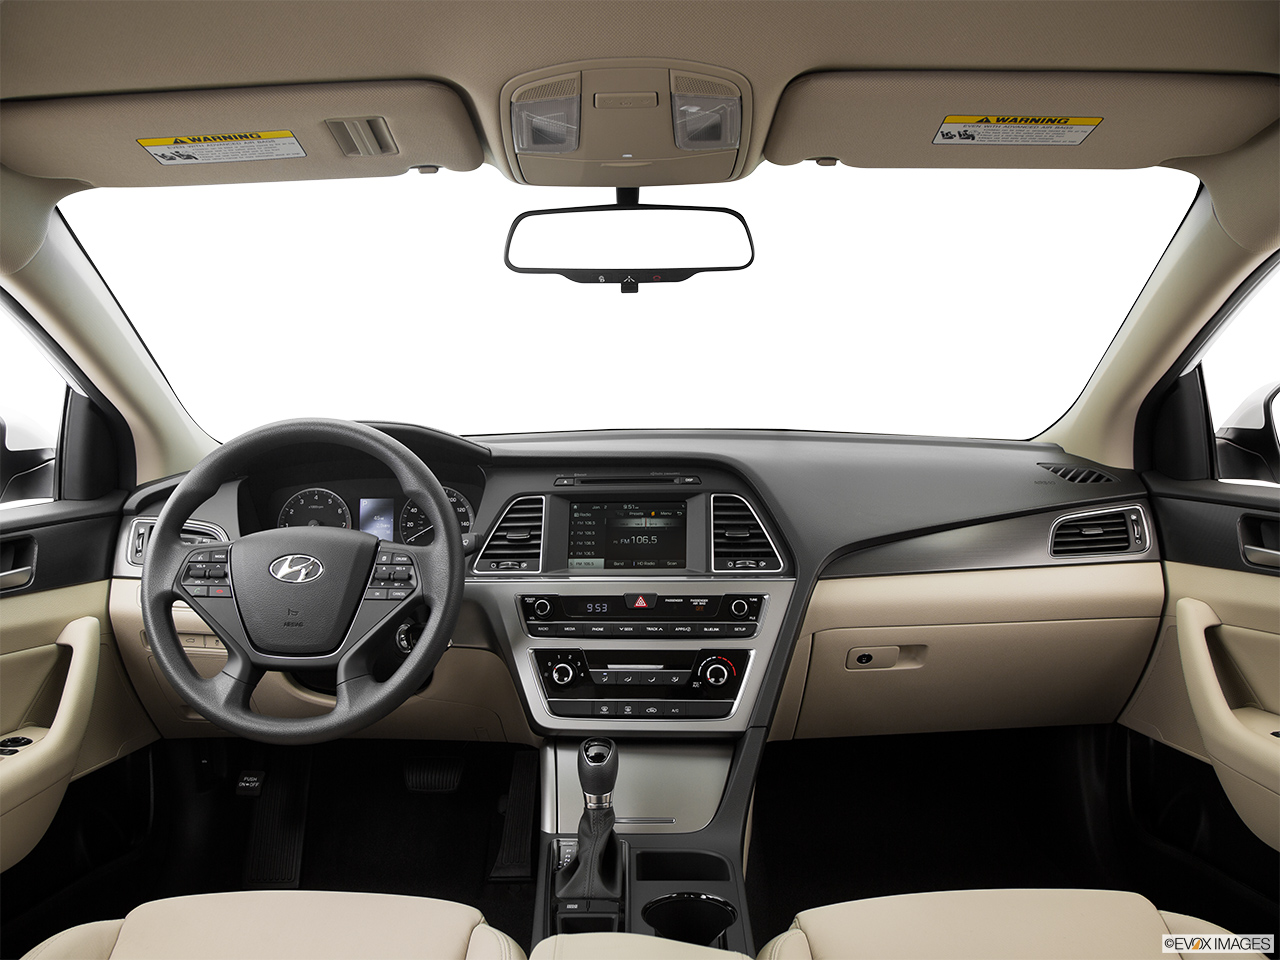 hyundai sonata 2016 2 0l turbo sport in uae new car. Black Bedroom Furniture Sets. Home Design Ideas